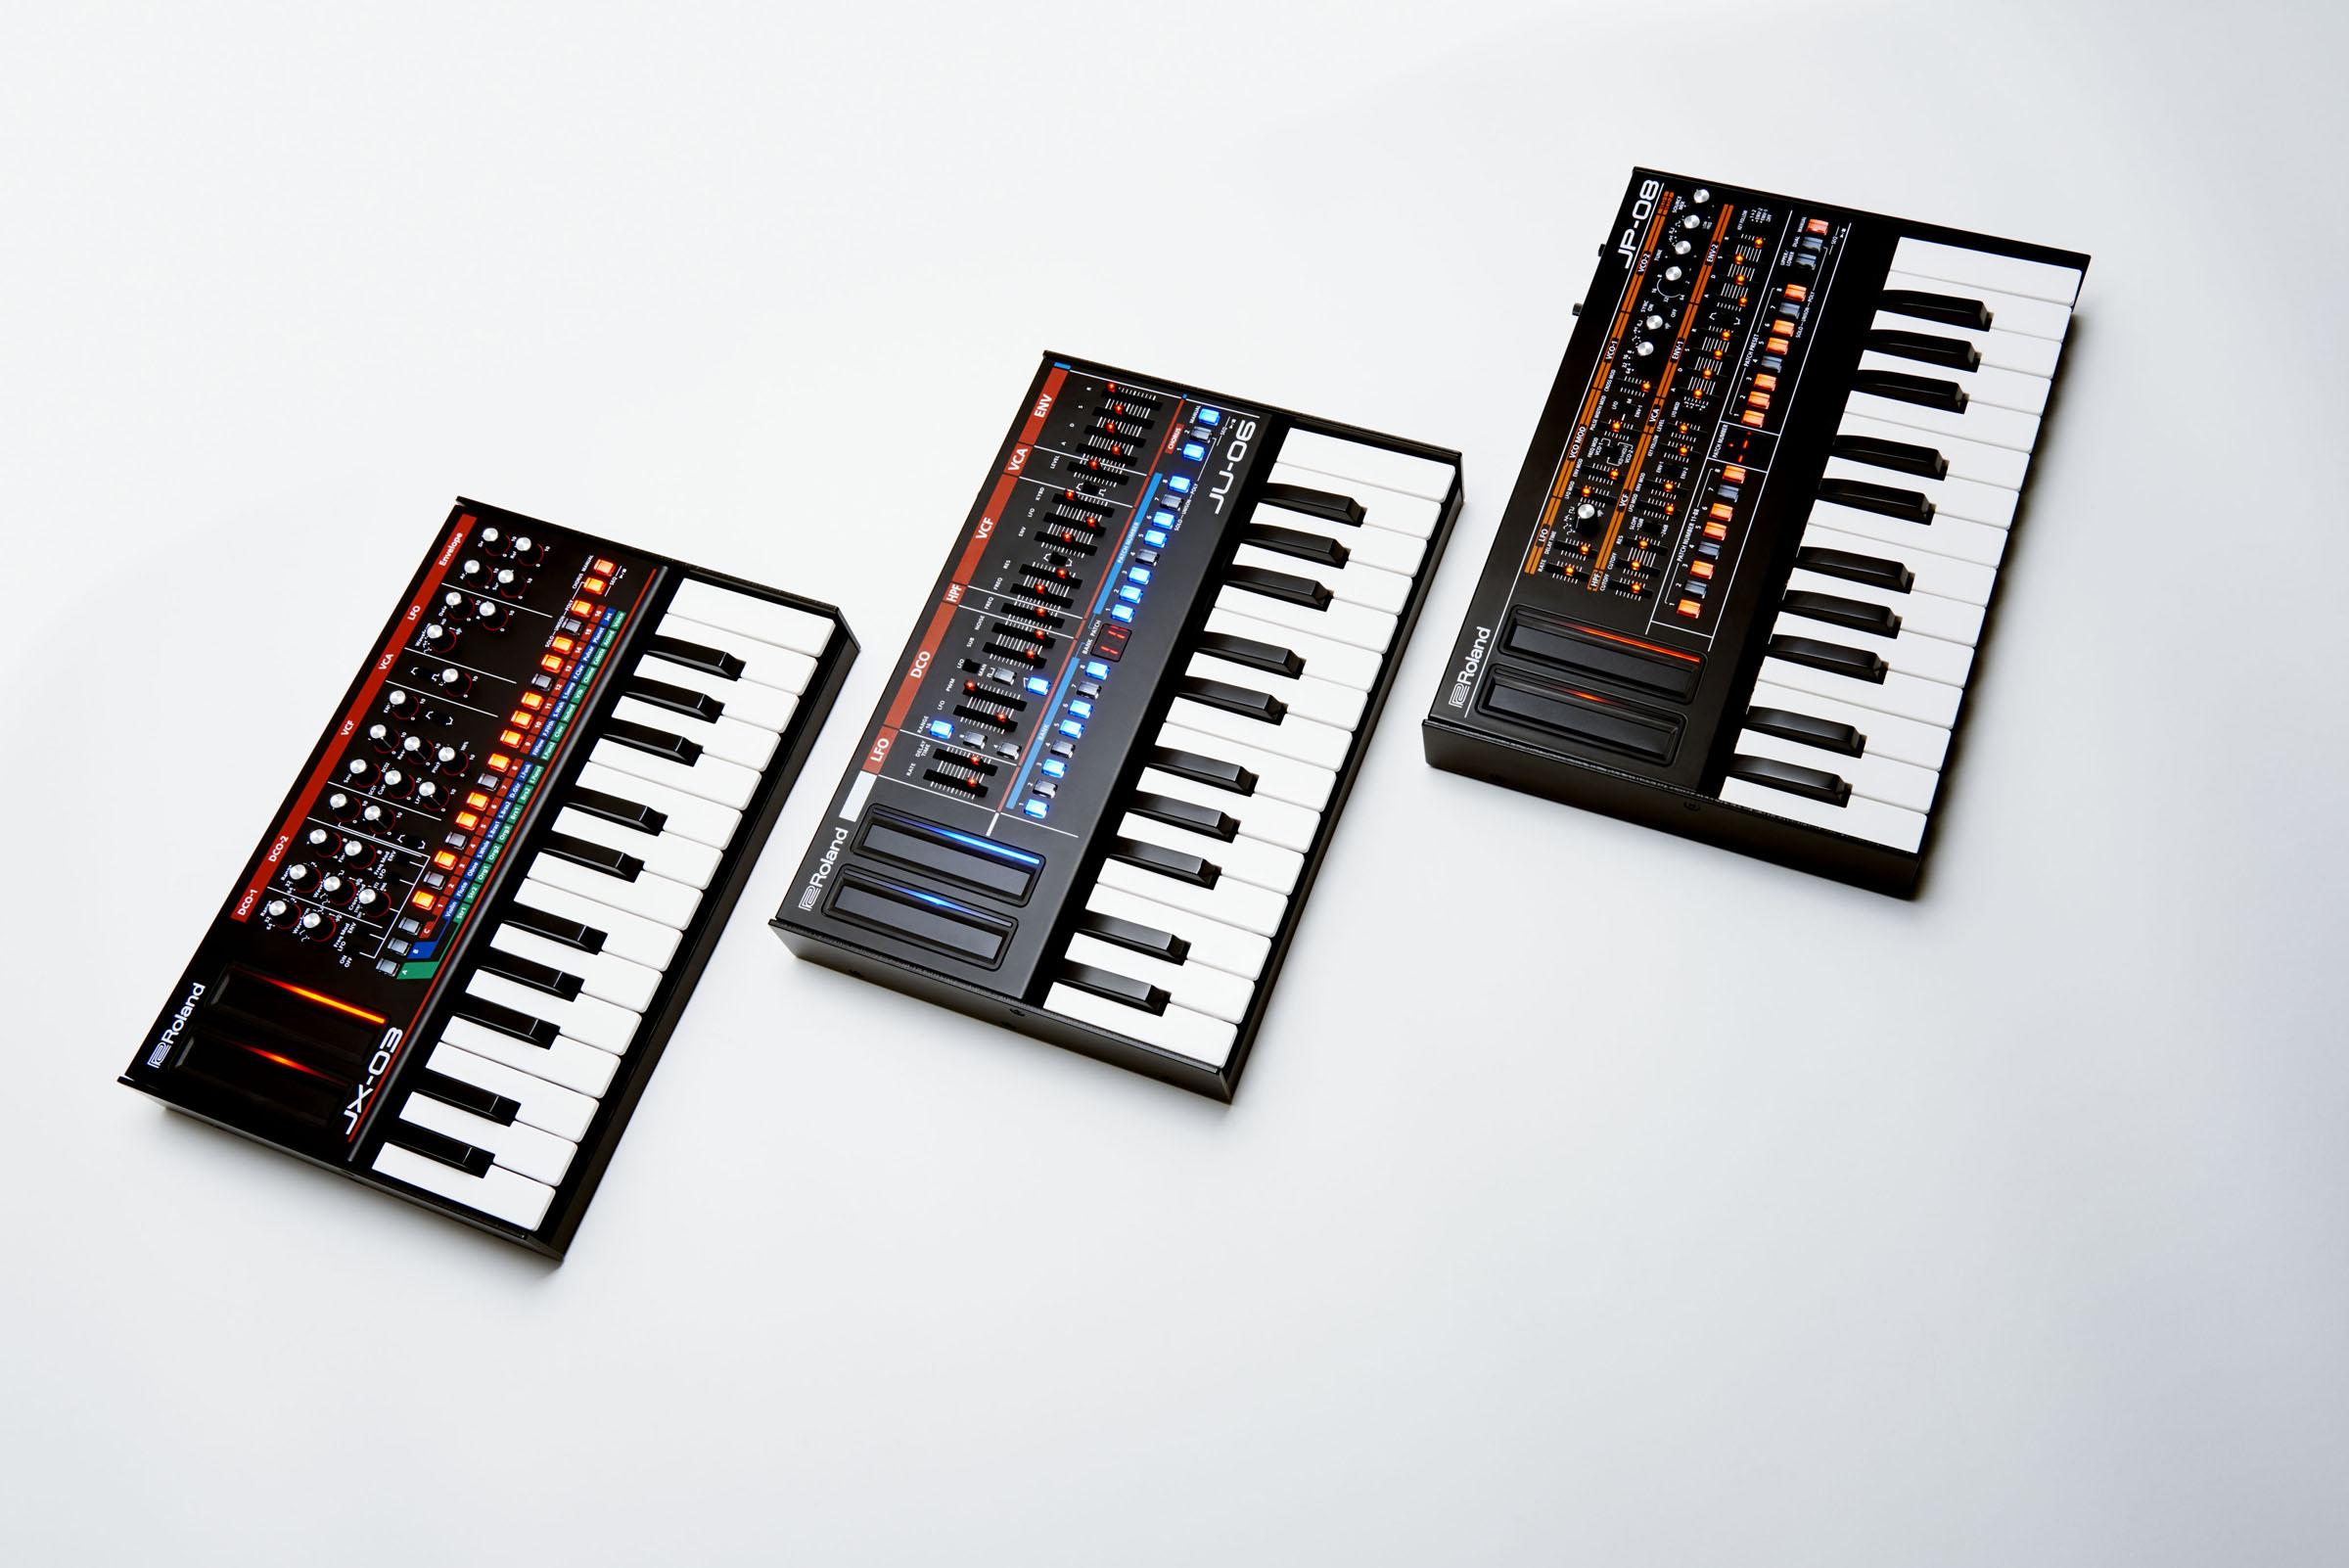 http://www.clynemedia.com/Roland/Boutique_Series/Roland_Boutique_Series.jpg